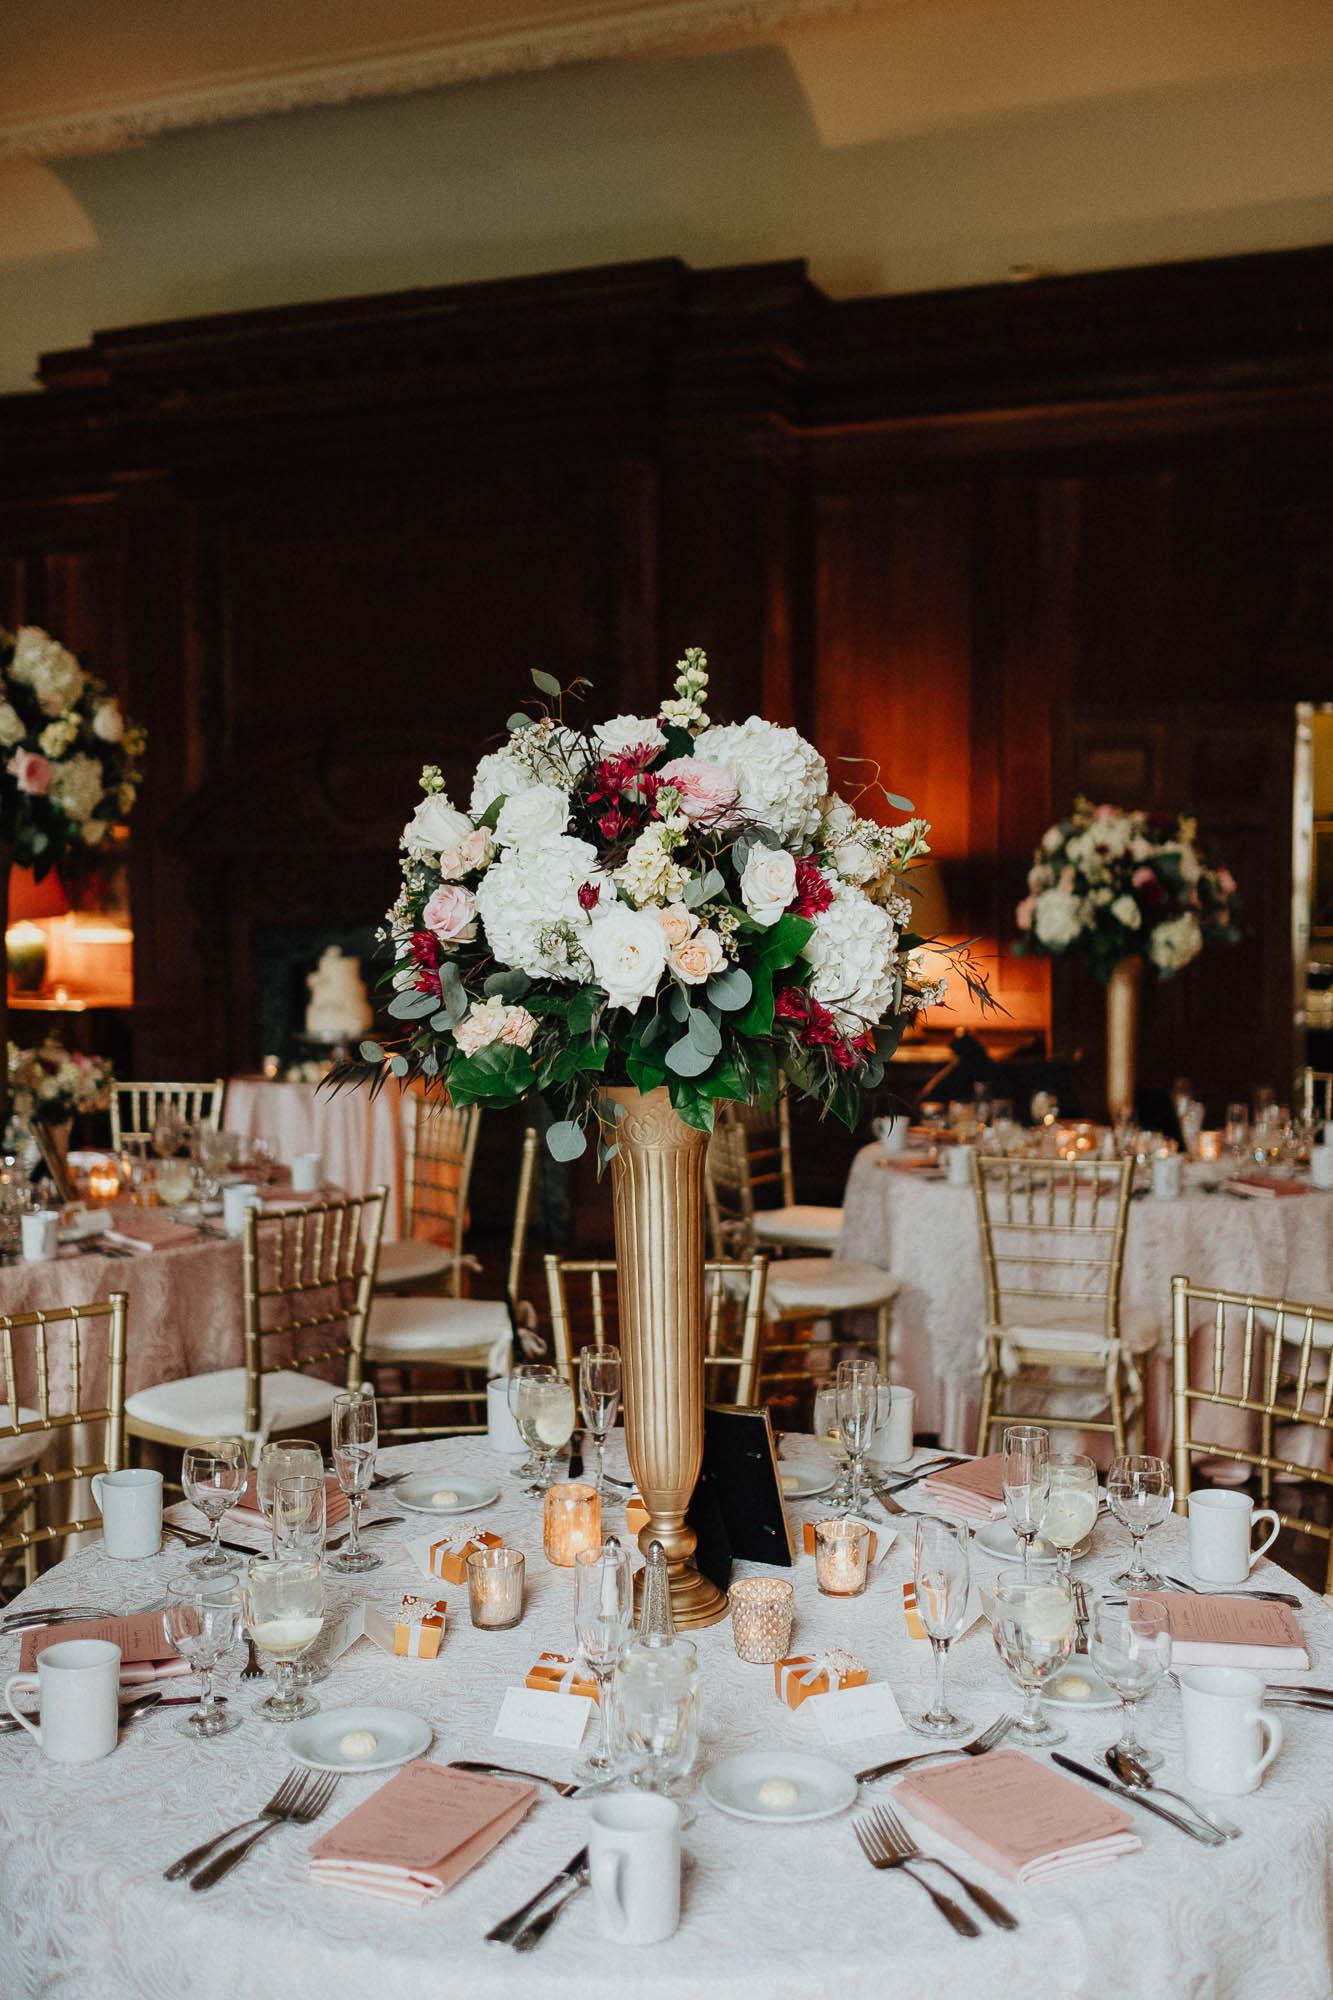 Claudia-Stephen-Peterloon-Wedding-Cincinnati-Ohio-066.jpg